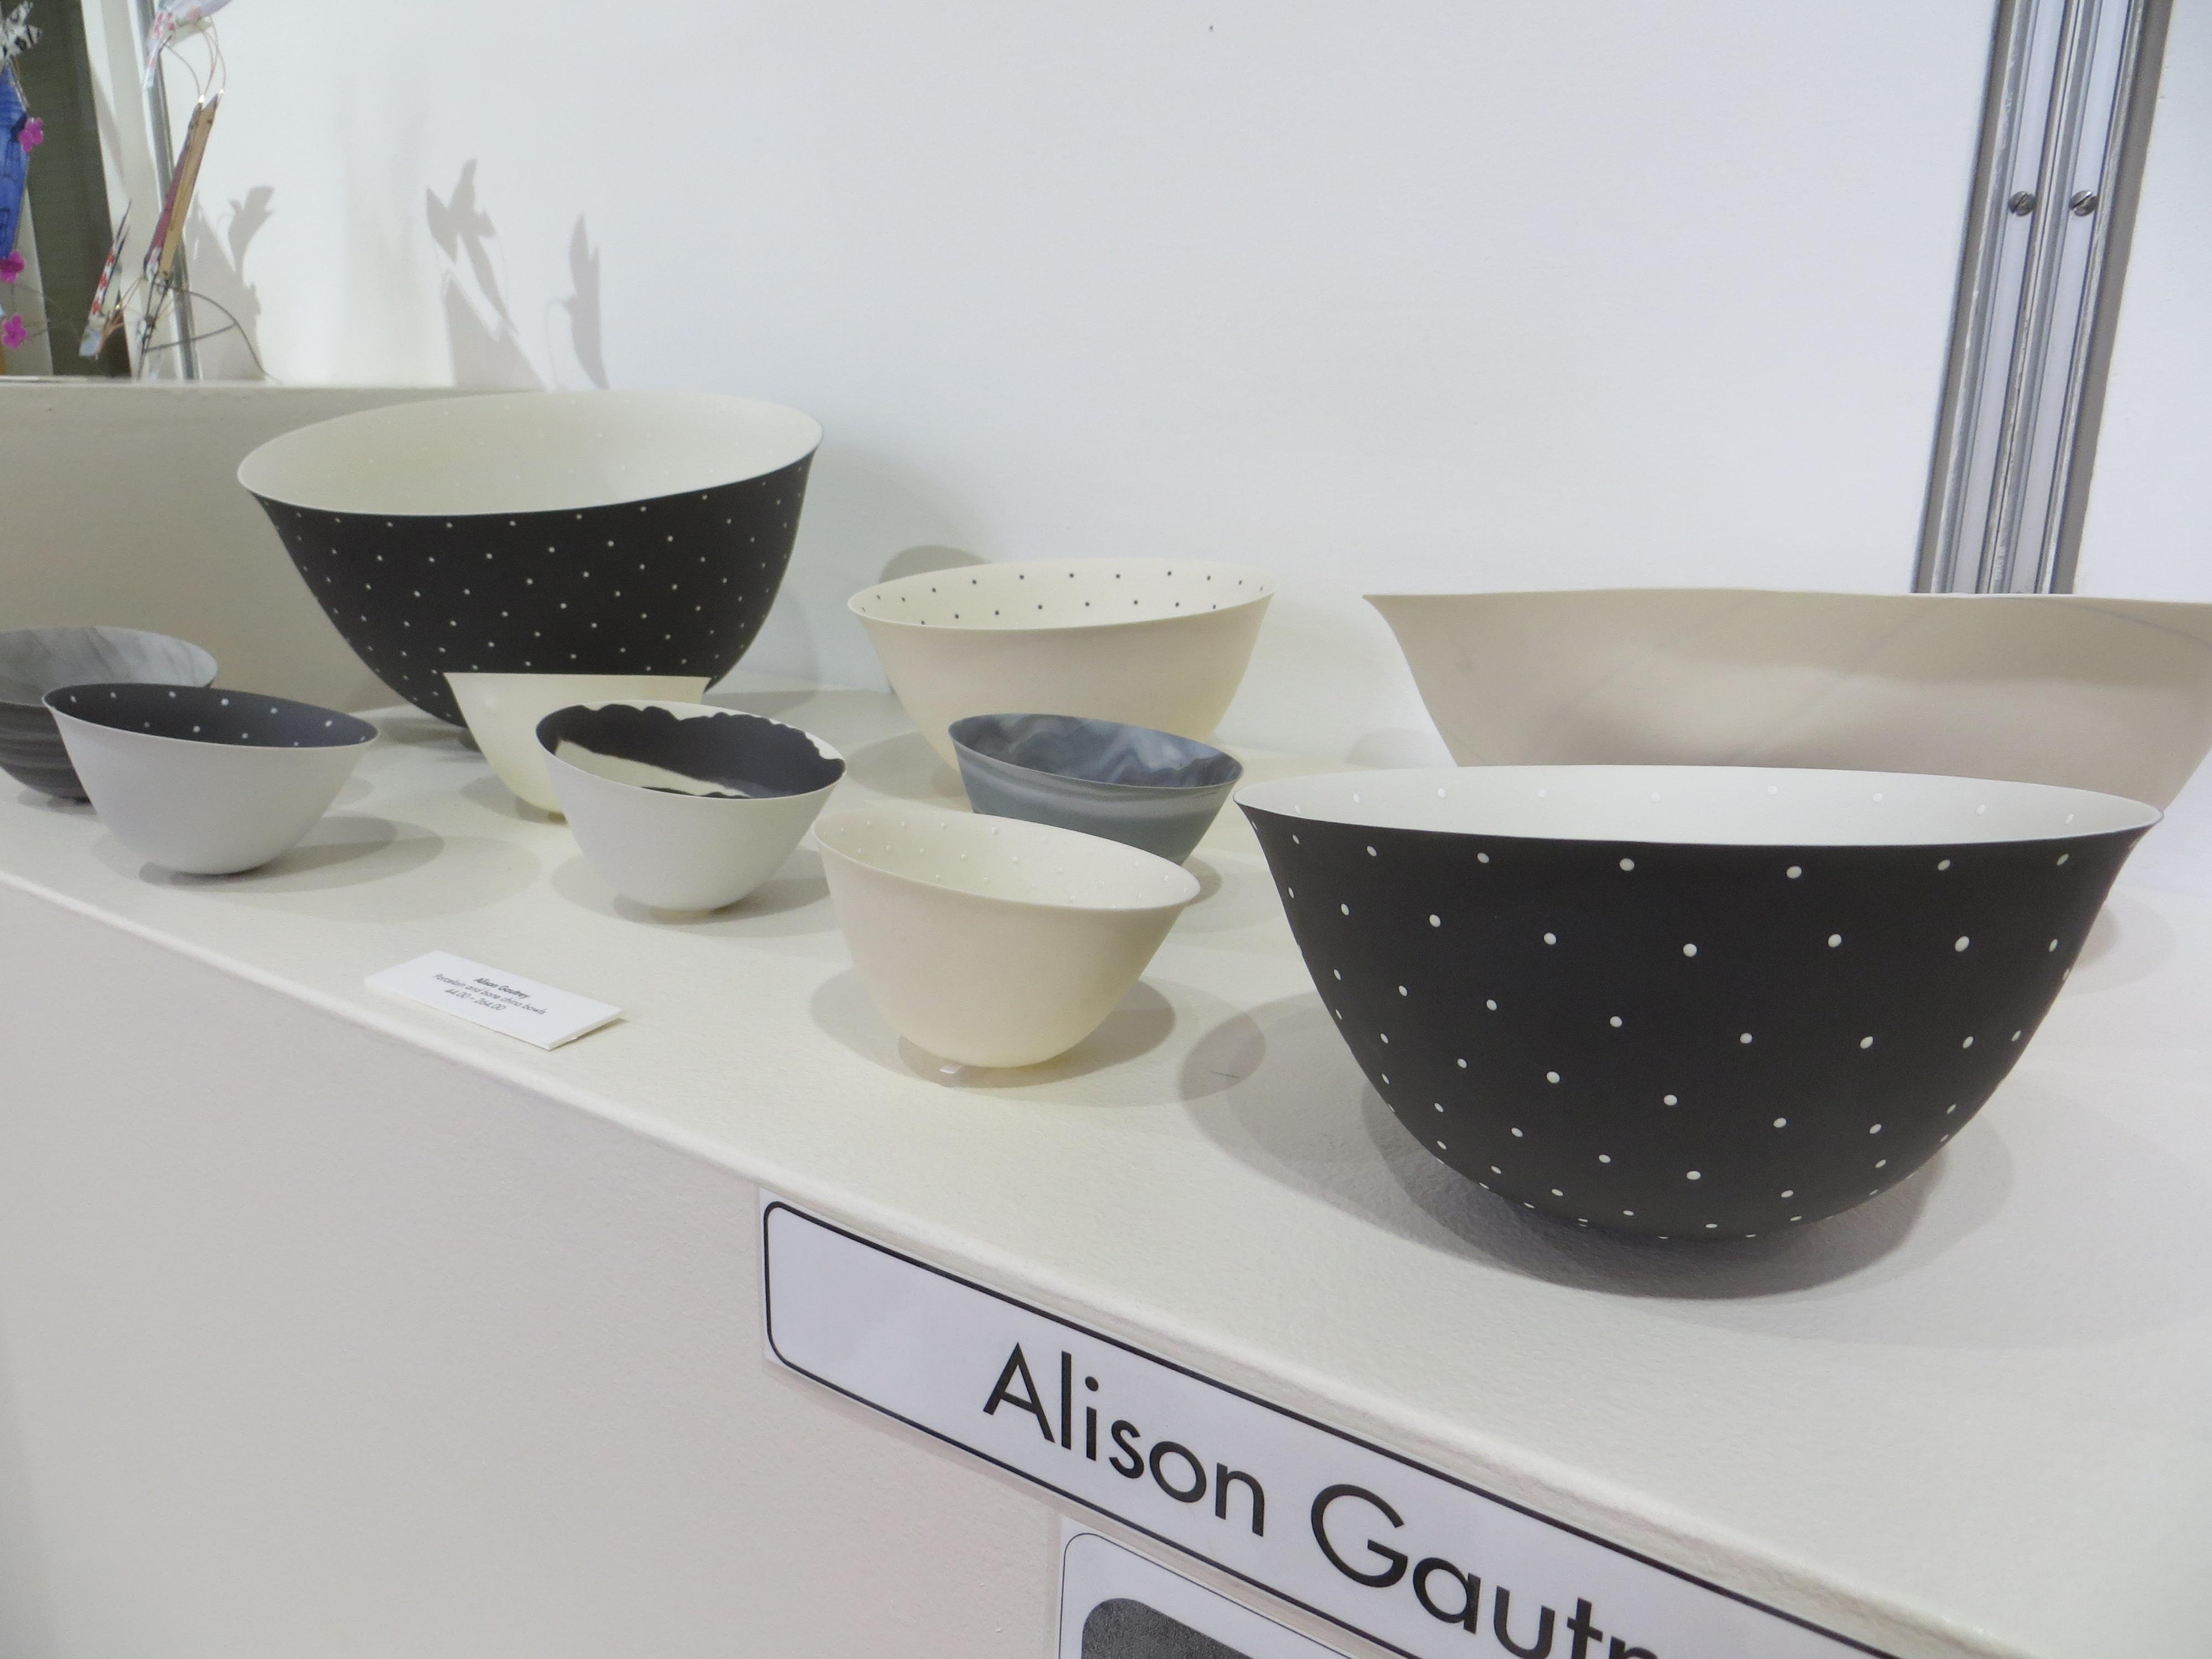 Alison Gautrey